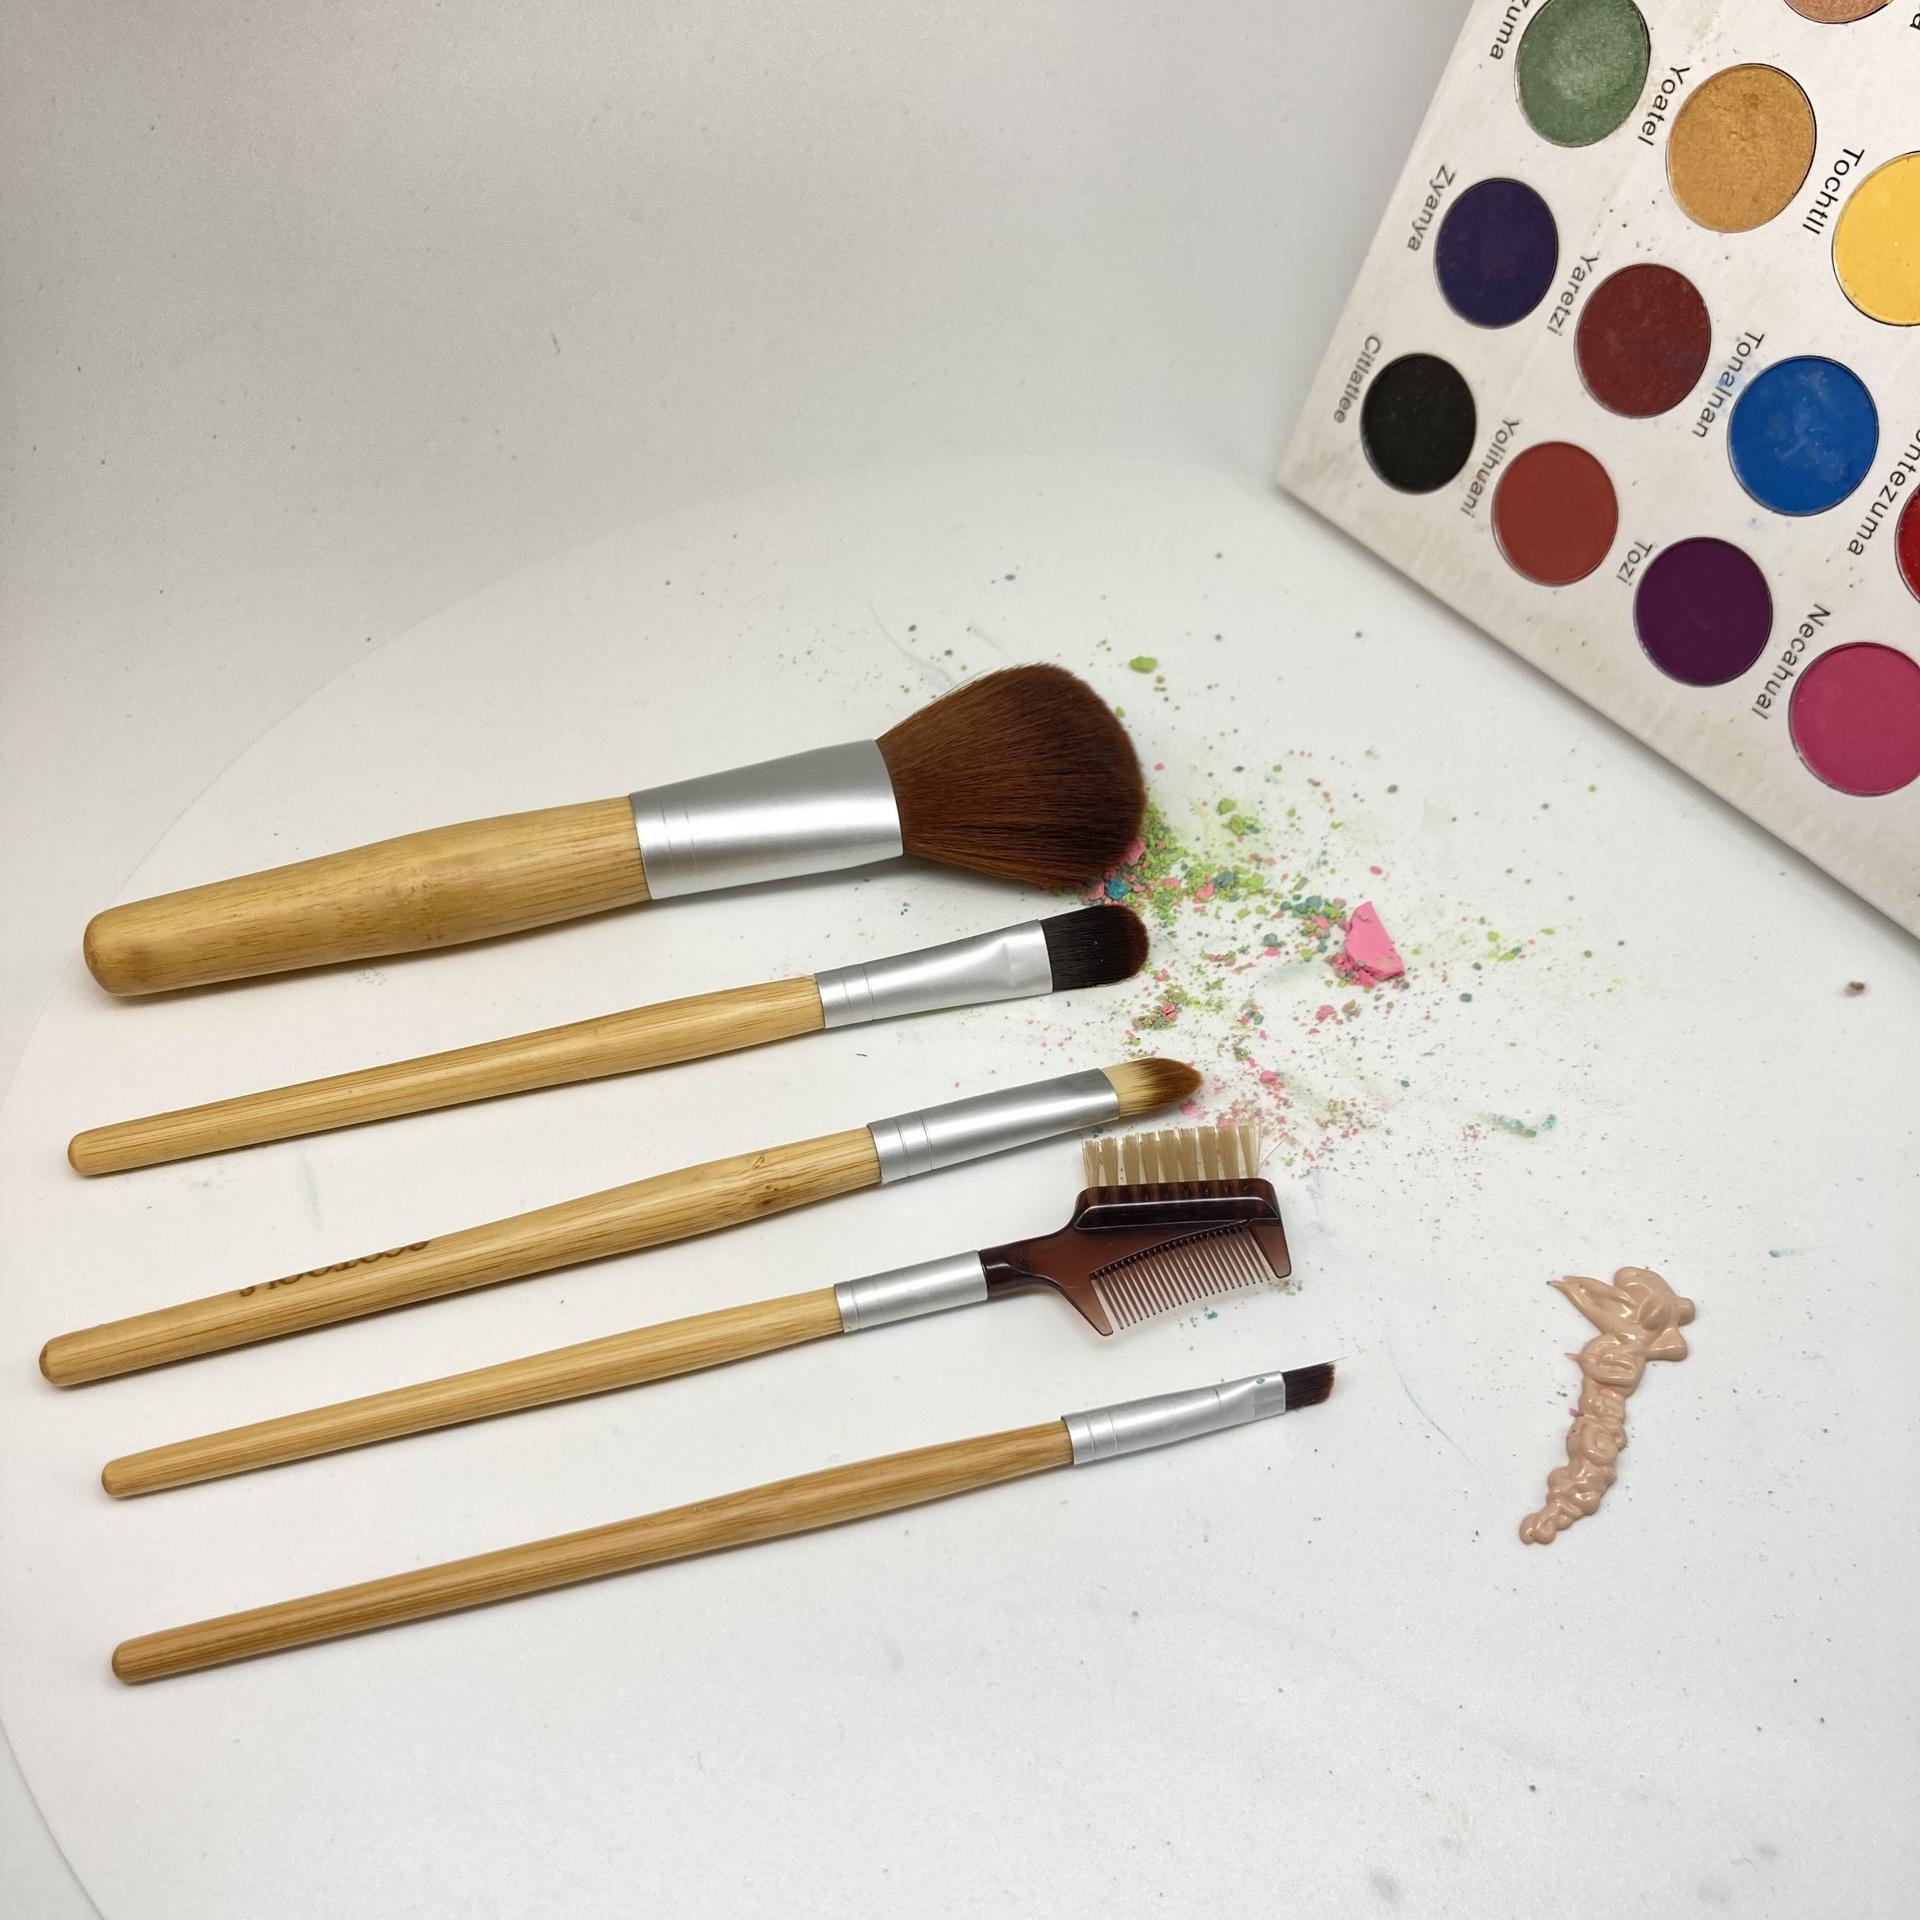 Private label bamboo cosmetic make up brush tool pro makeup brush set